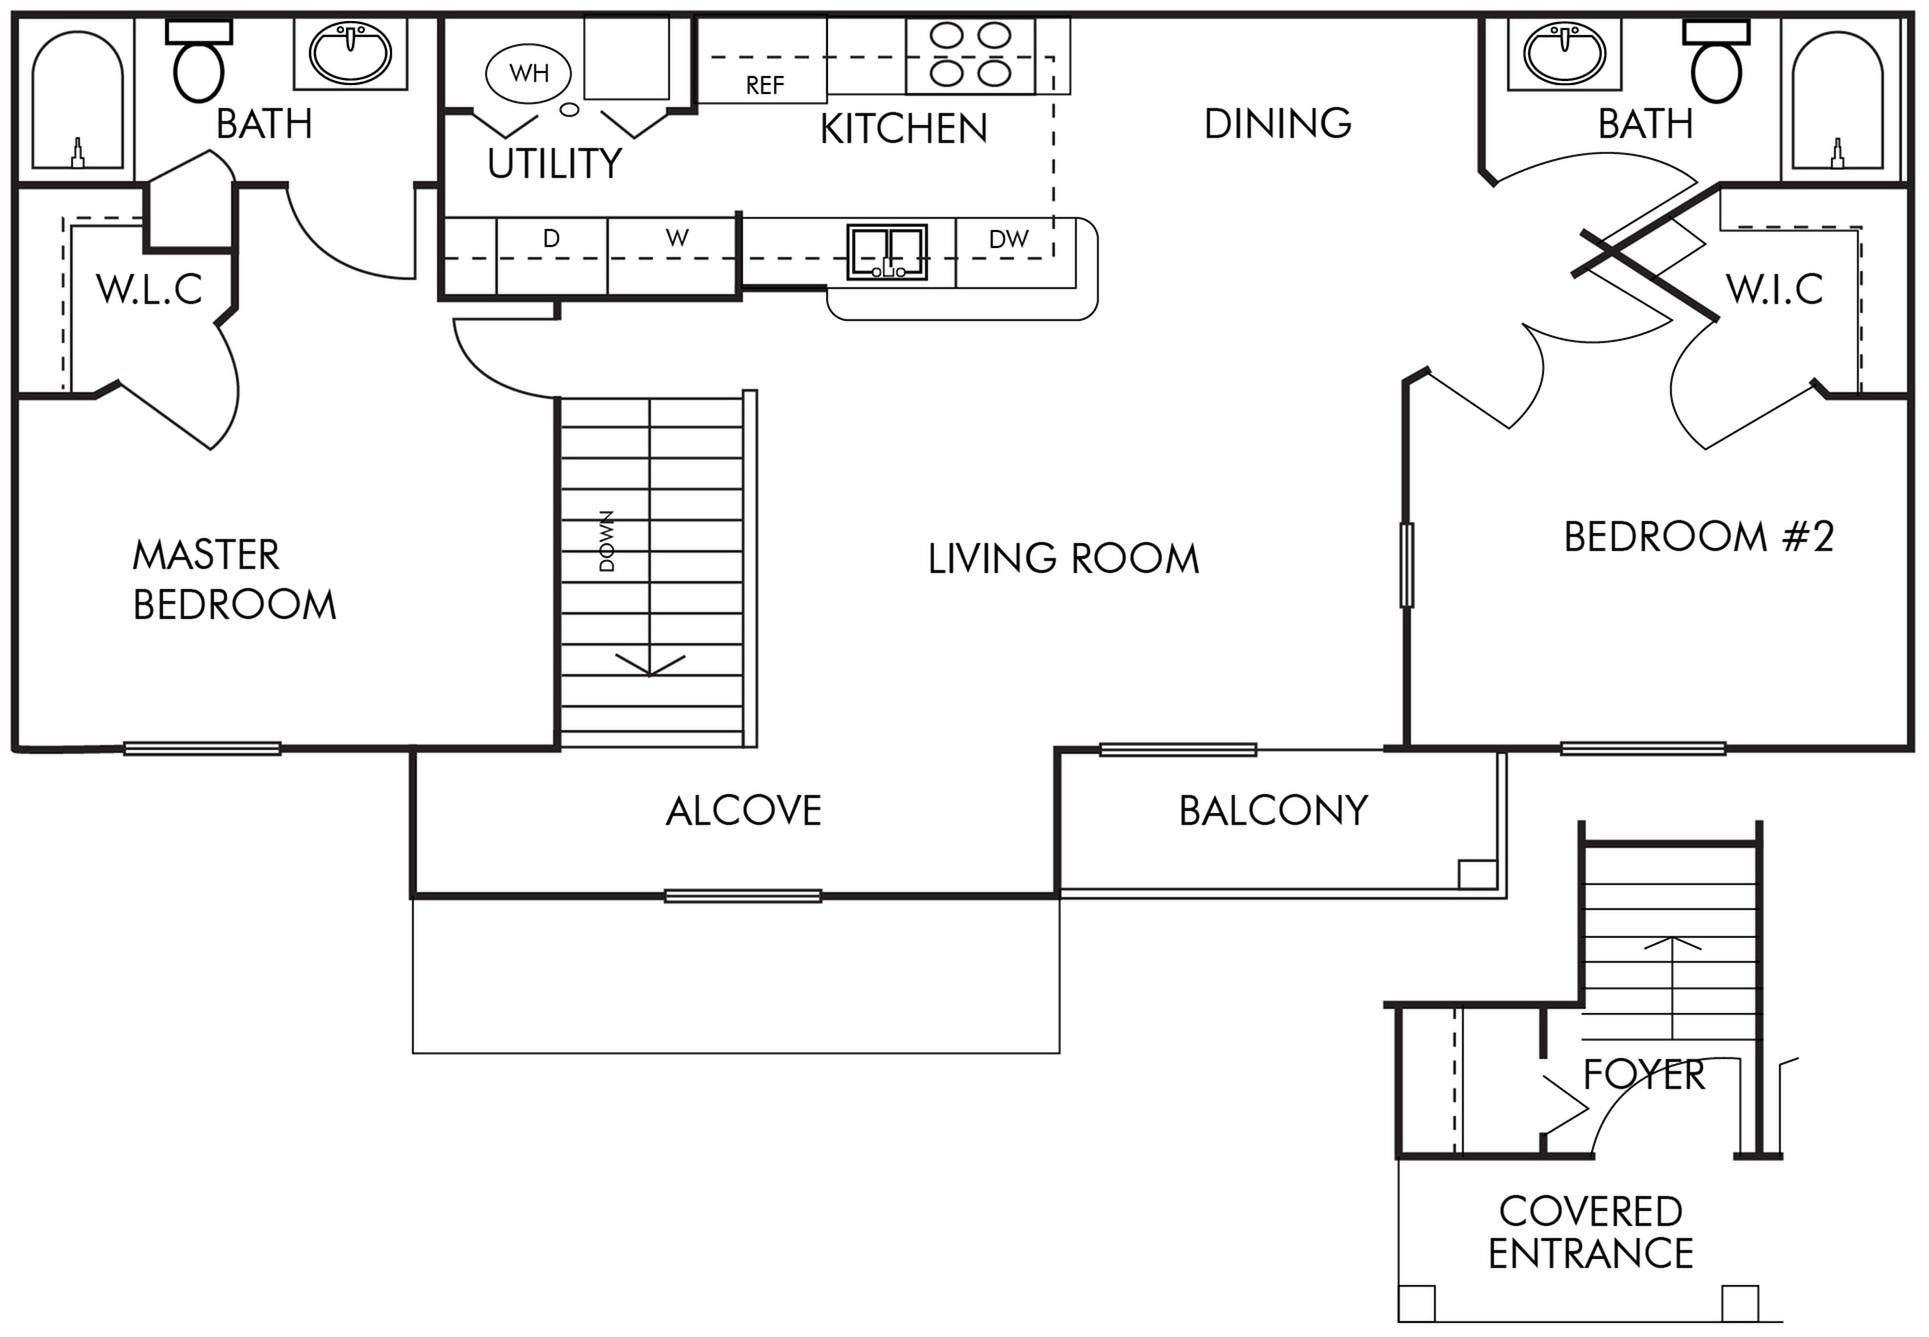 2 Bed, 2 Bath- 2nd Floor